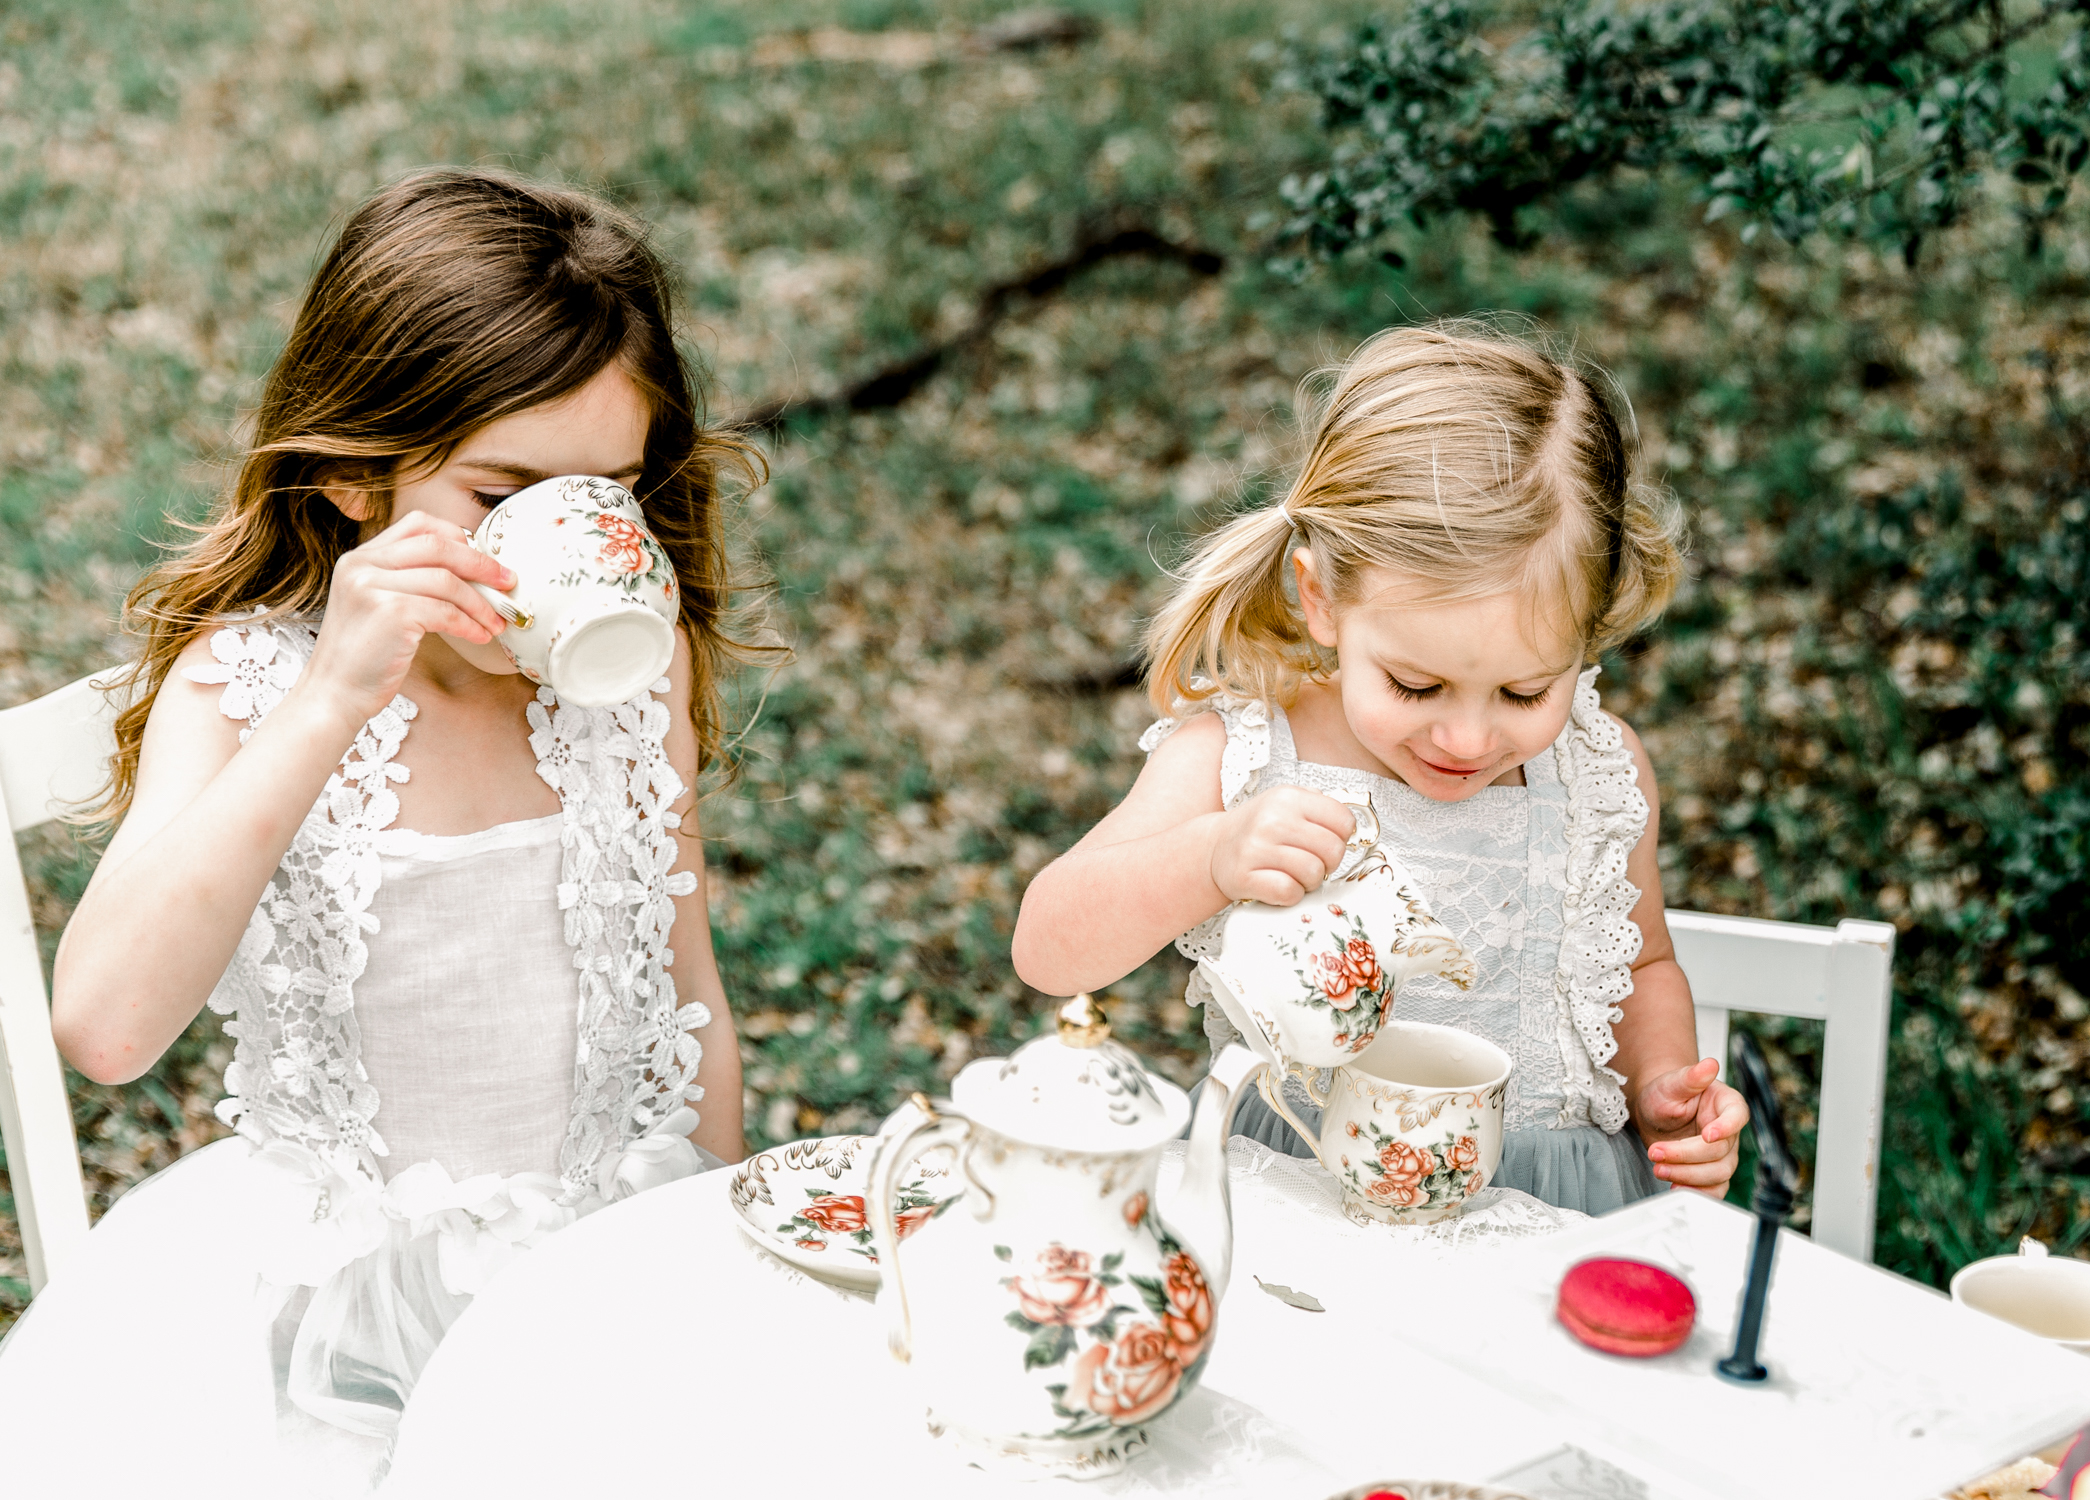 lifestyle-family-photographer-franklin-tea-time-12.jpg